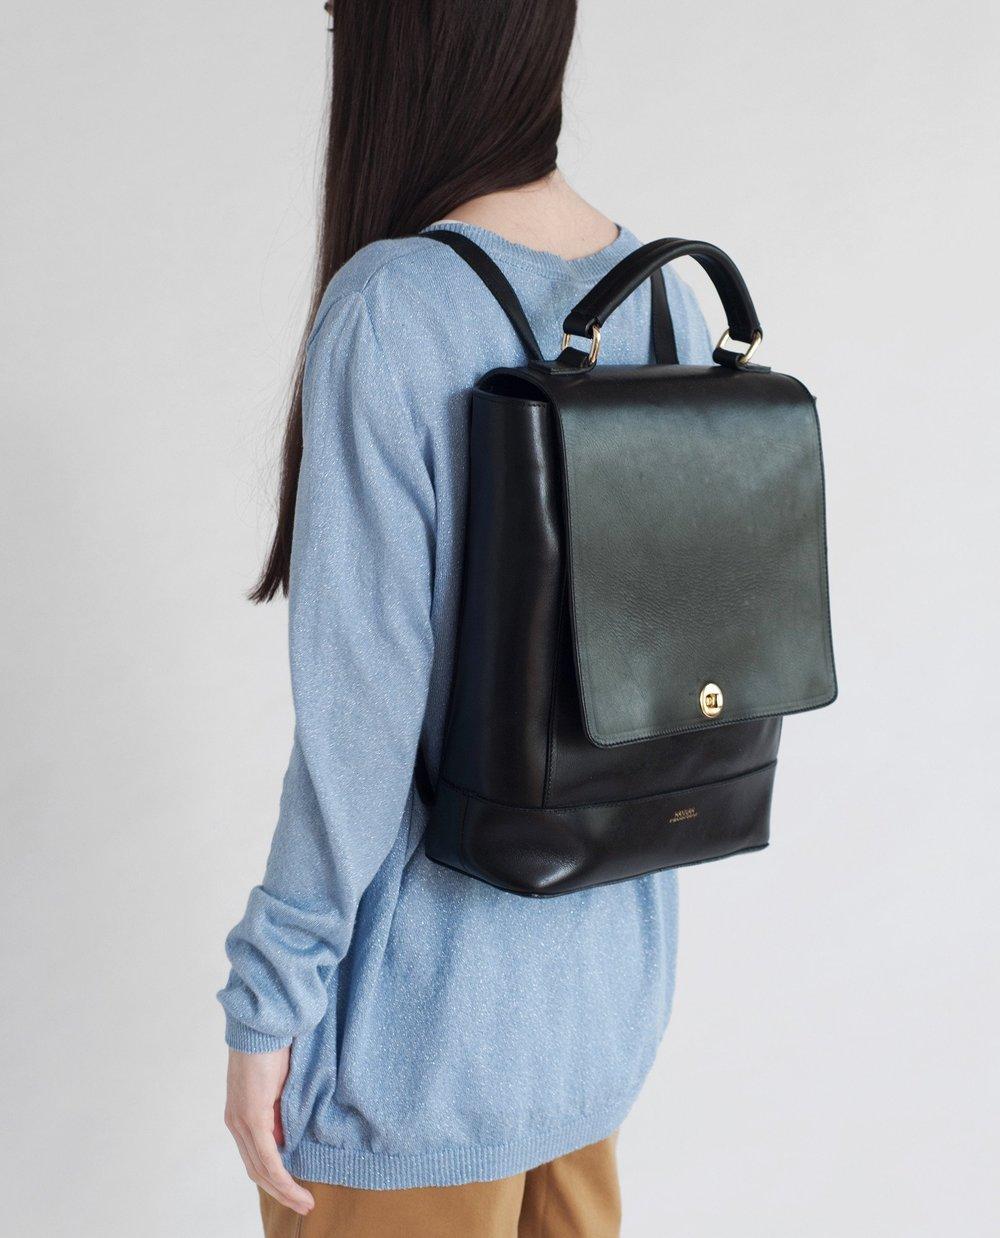 Bruges-Beaumont-Organic-Luxury-Leather-Multiway-Backpack-In-Black-4.jpg